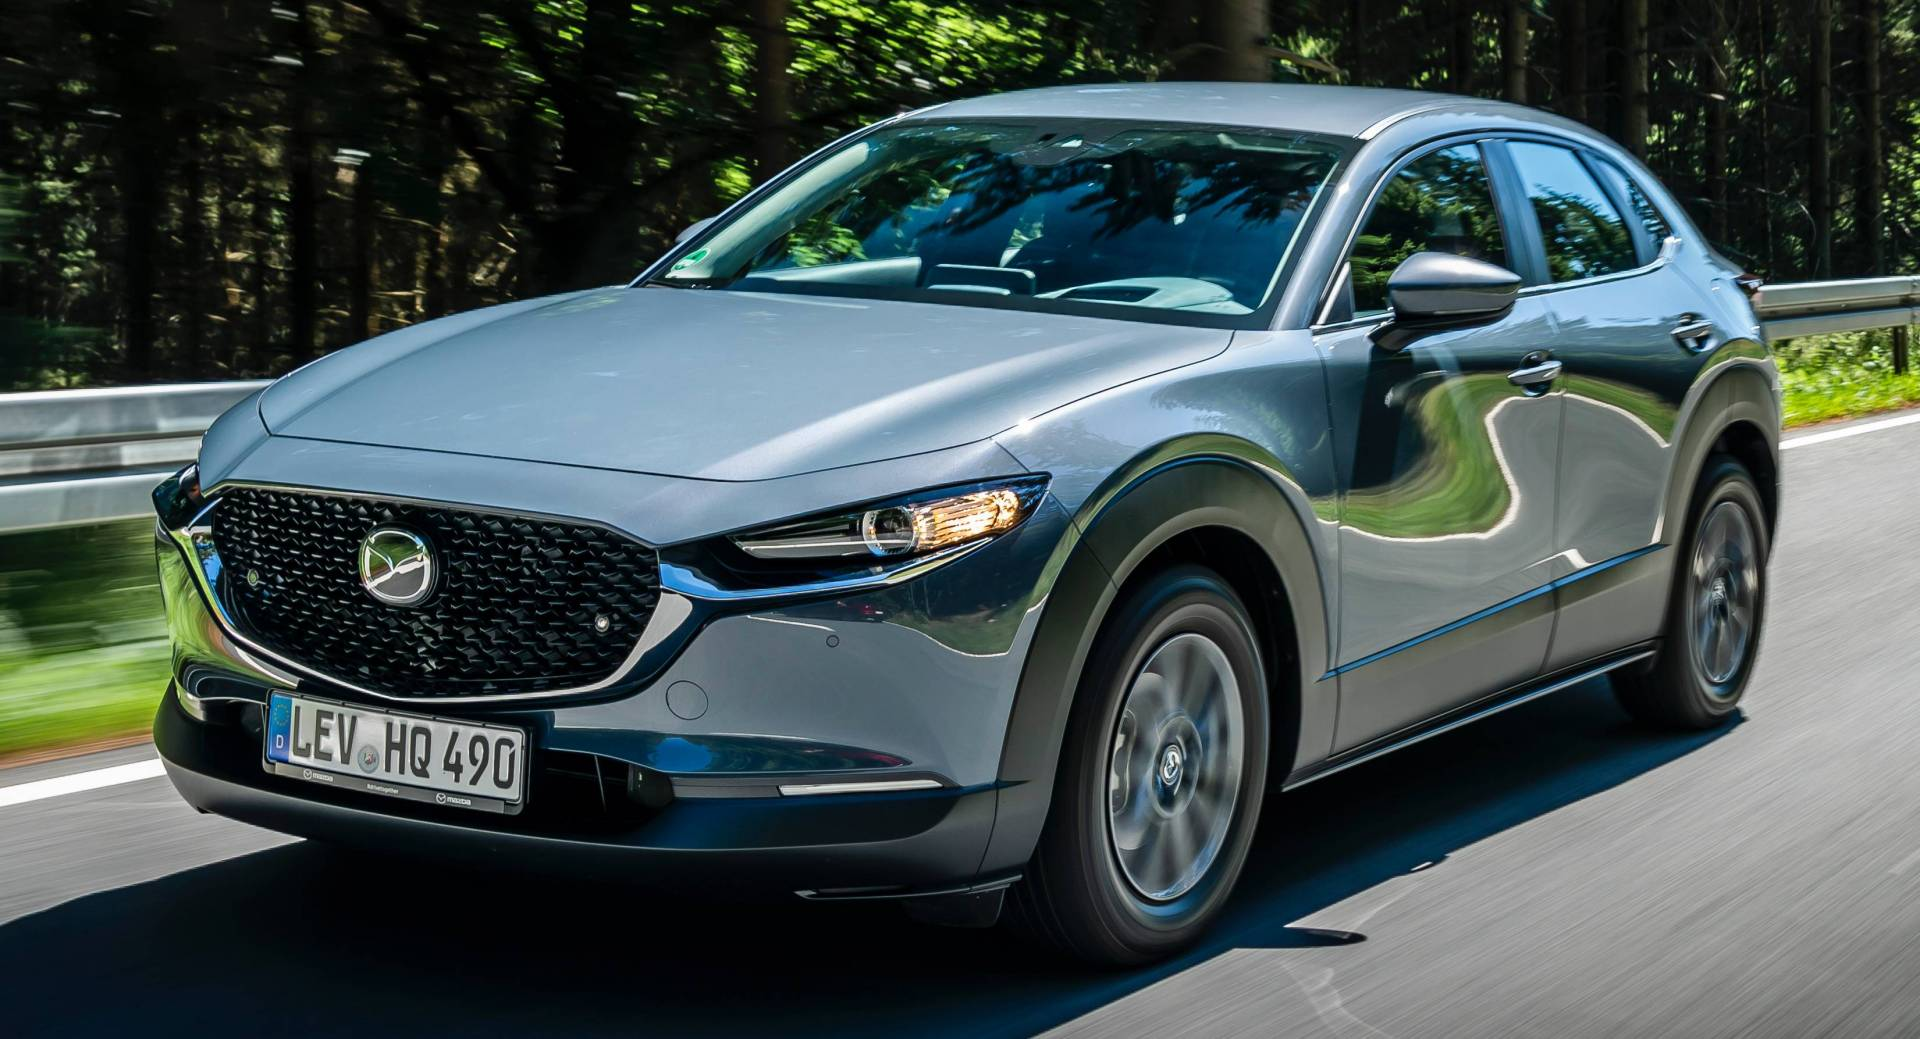 2020 Mazda CX-30: Design, Specs, Release >> Europe S 2020 Mazda Cx 30 Reveals All Its Secrets In 206